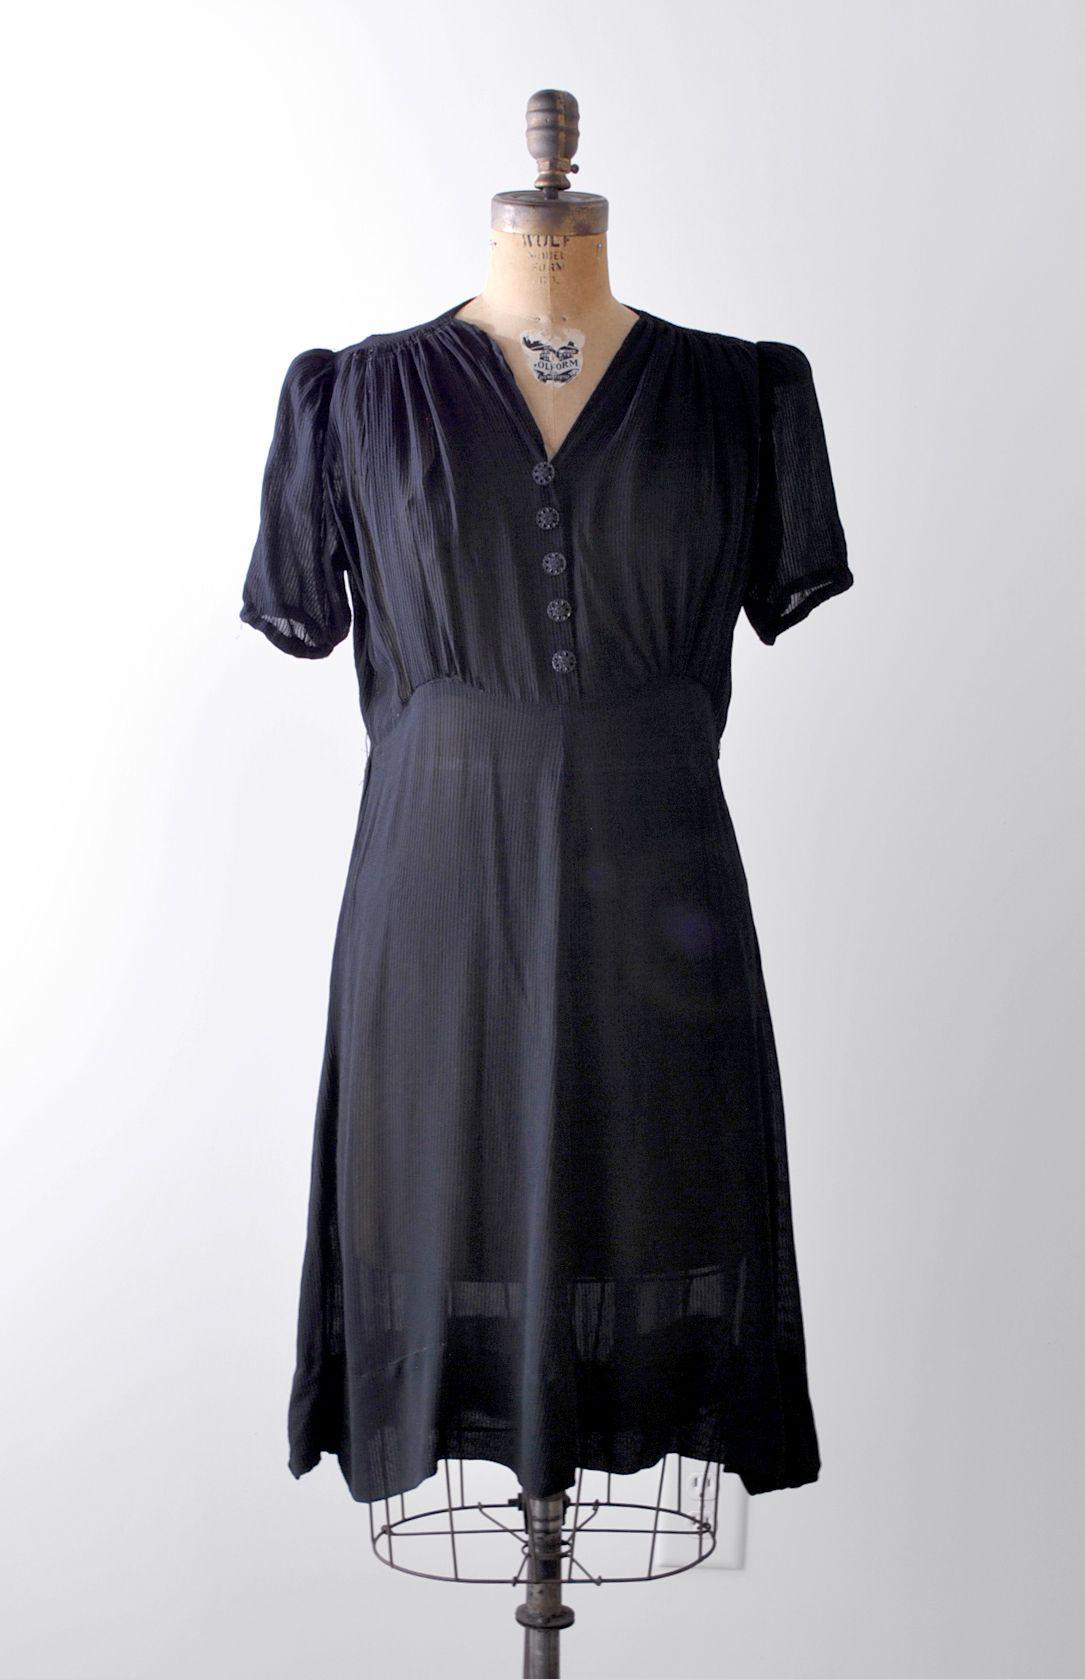 1930 S Black Chiffon Dress Vintage 40s Large Dress Etsy Black Chiffon Dress Dresses Large Dress [ 1679 x 1085 Pixel ]